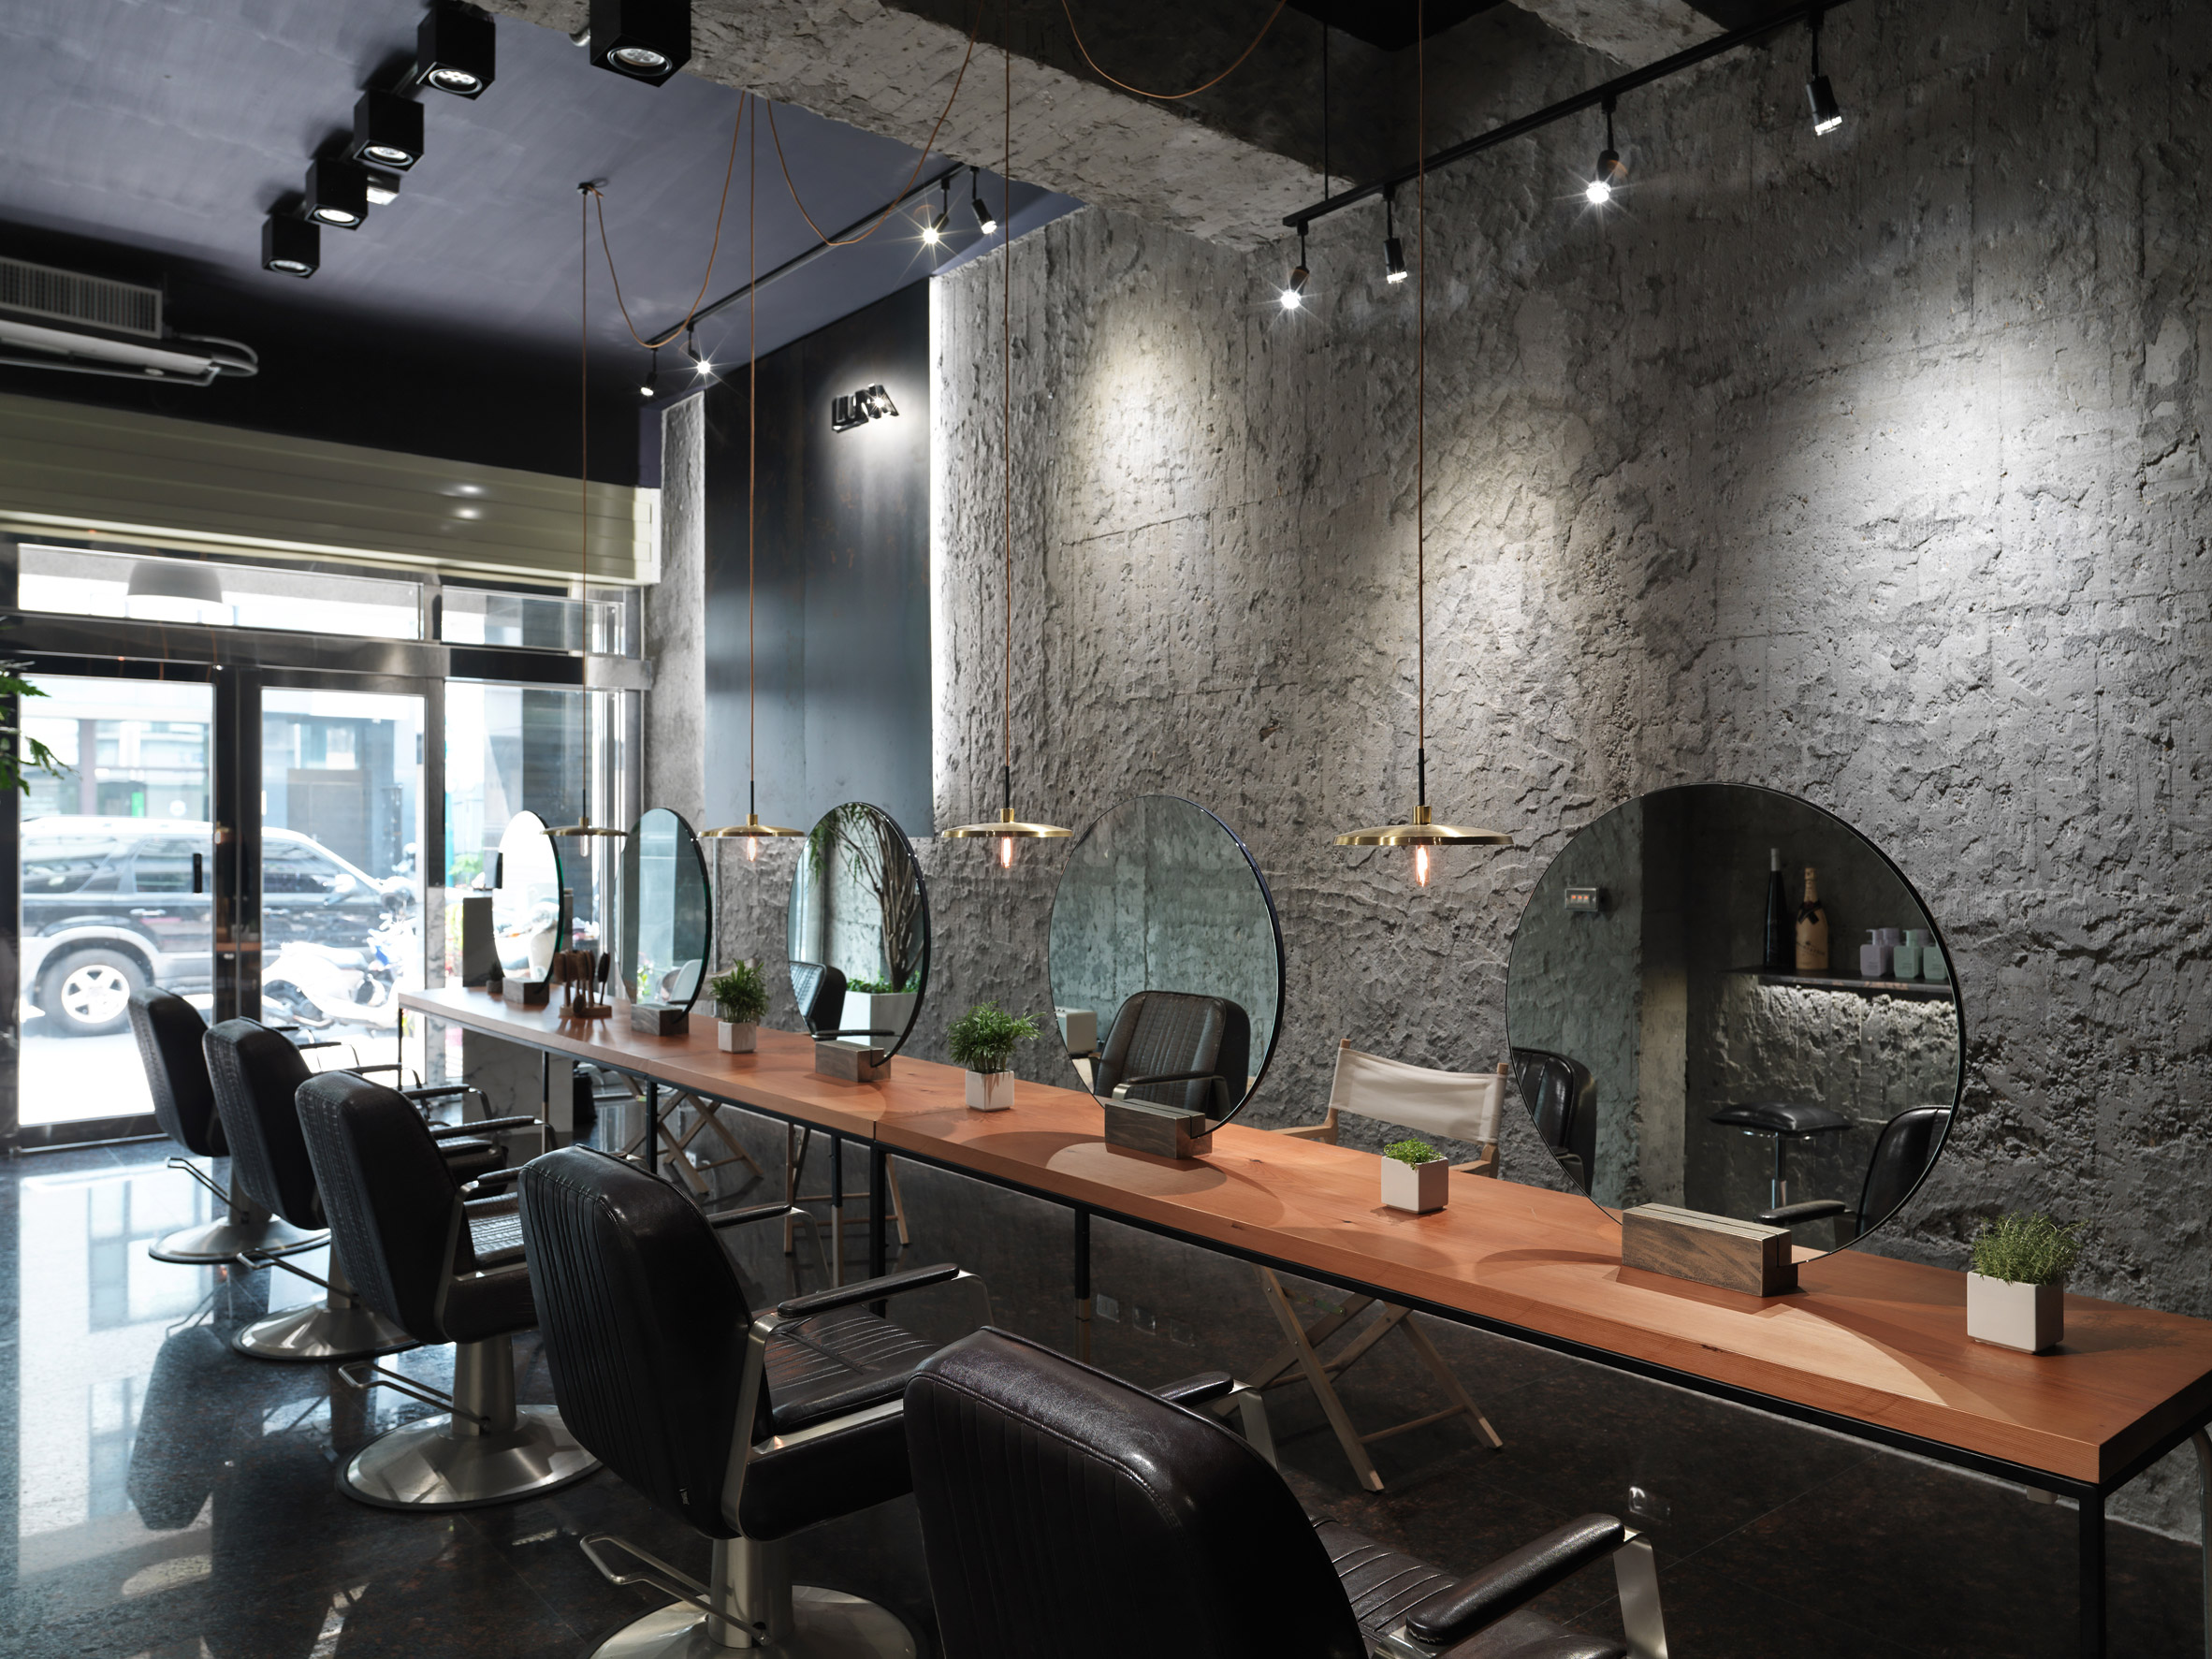 luna-salon-soar-design-interiors-changhua-taiwan_dezeen_2364_col_4